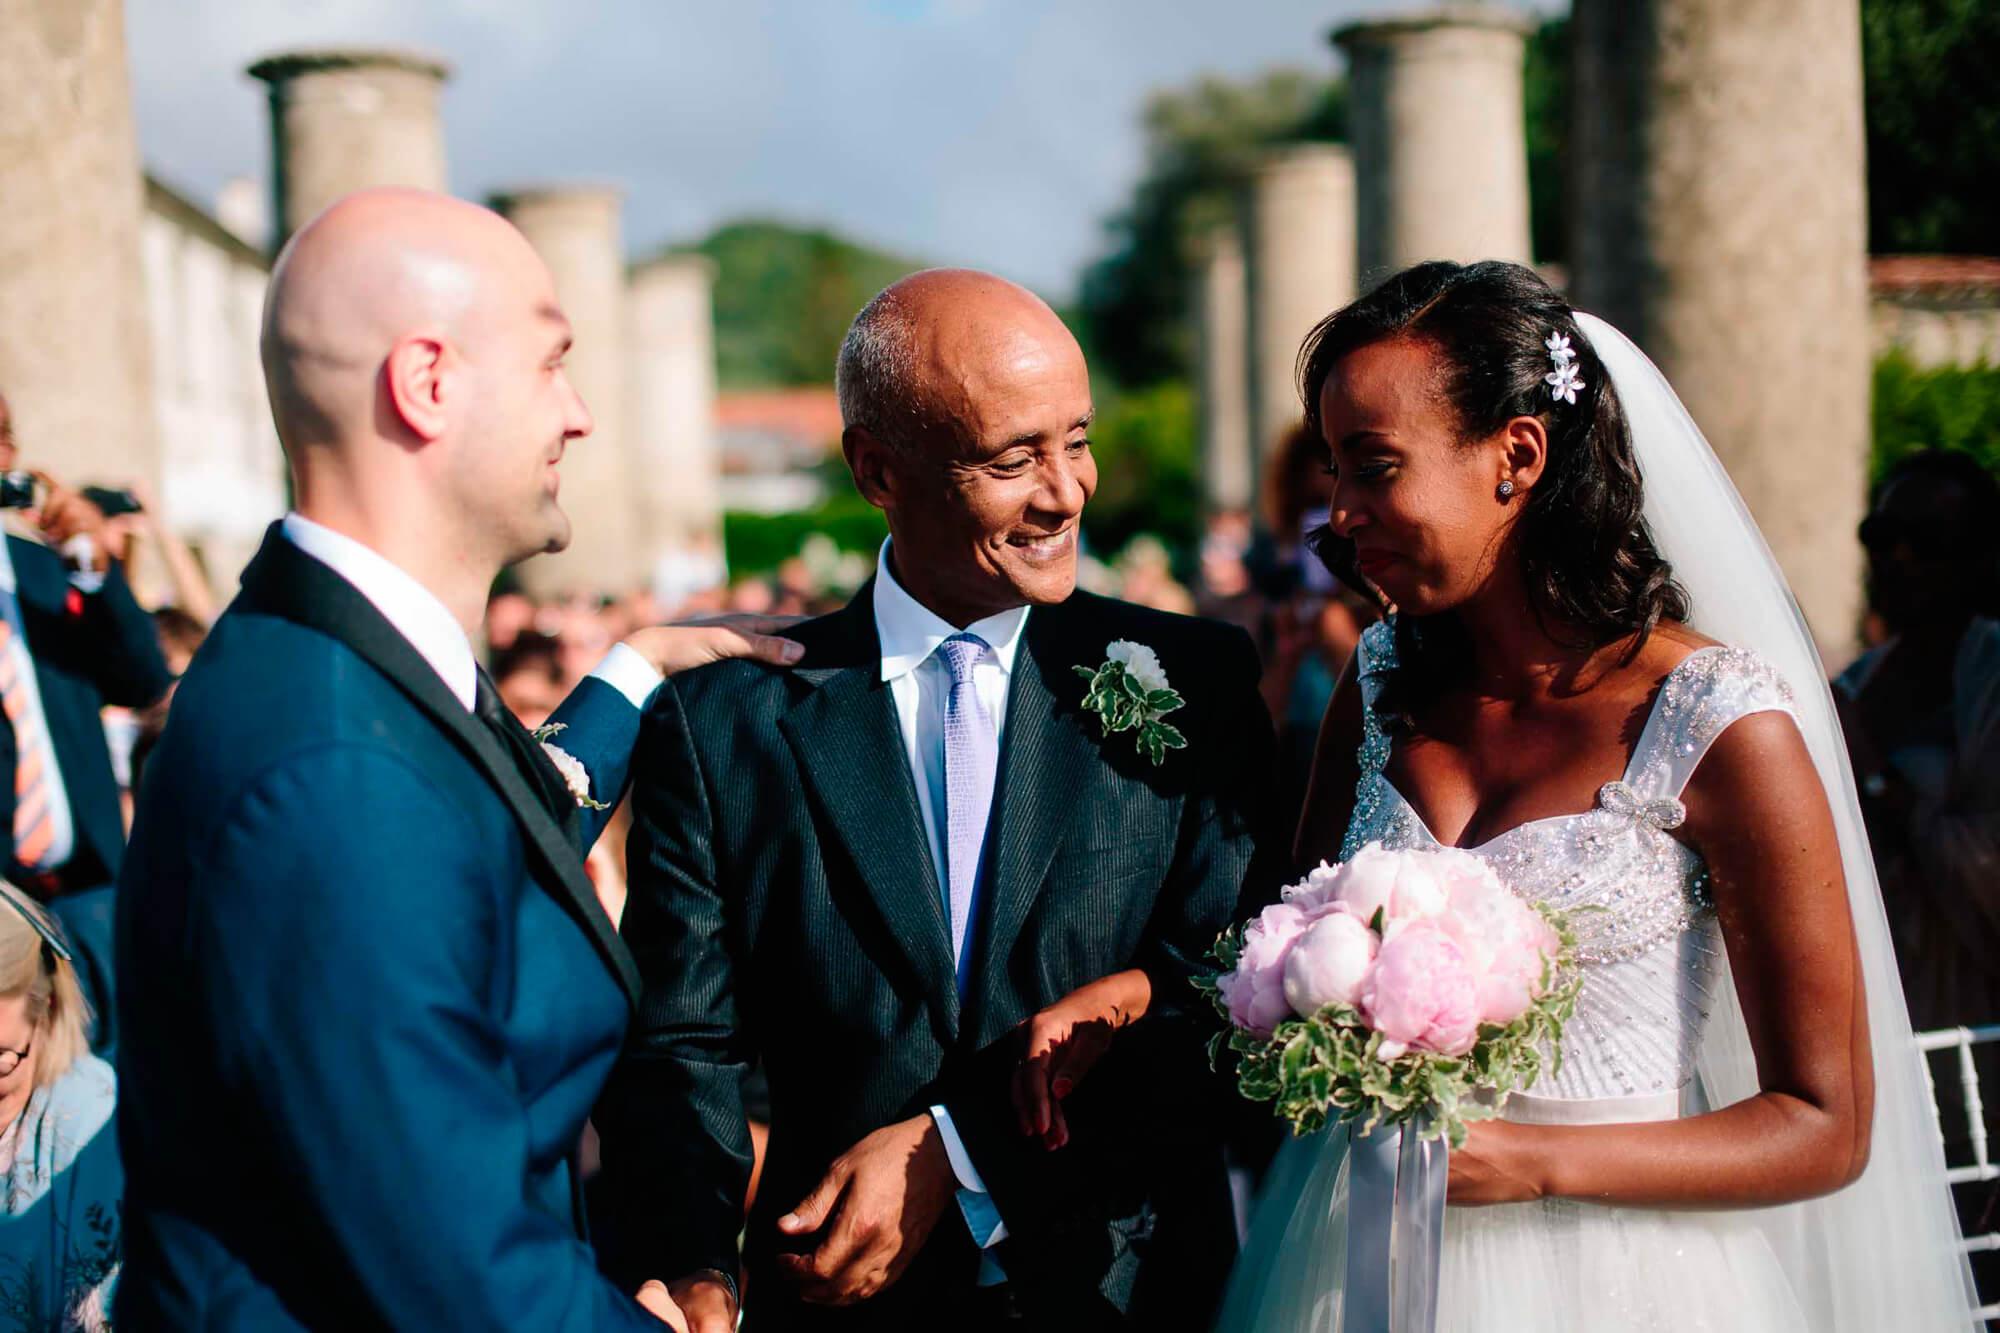 058-sorrento-wedding-photographer.jpg